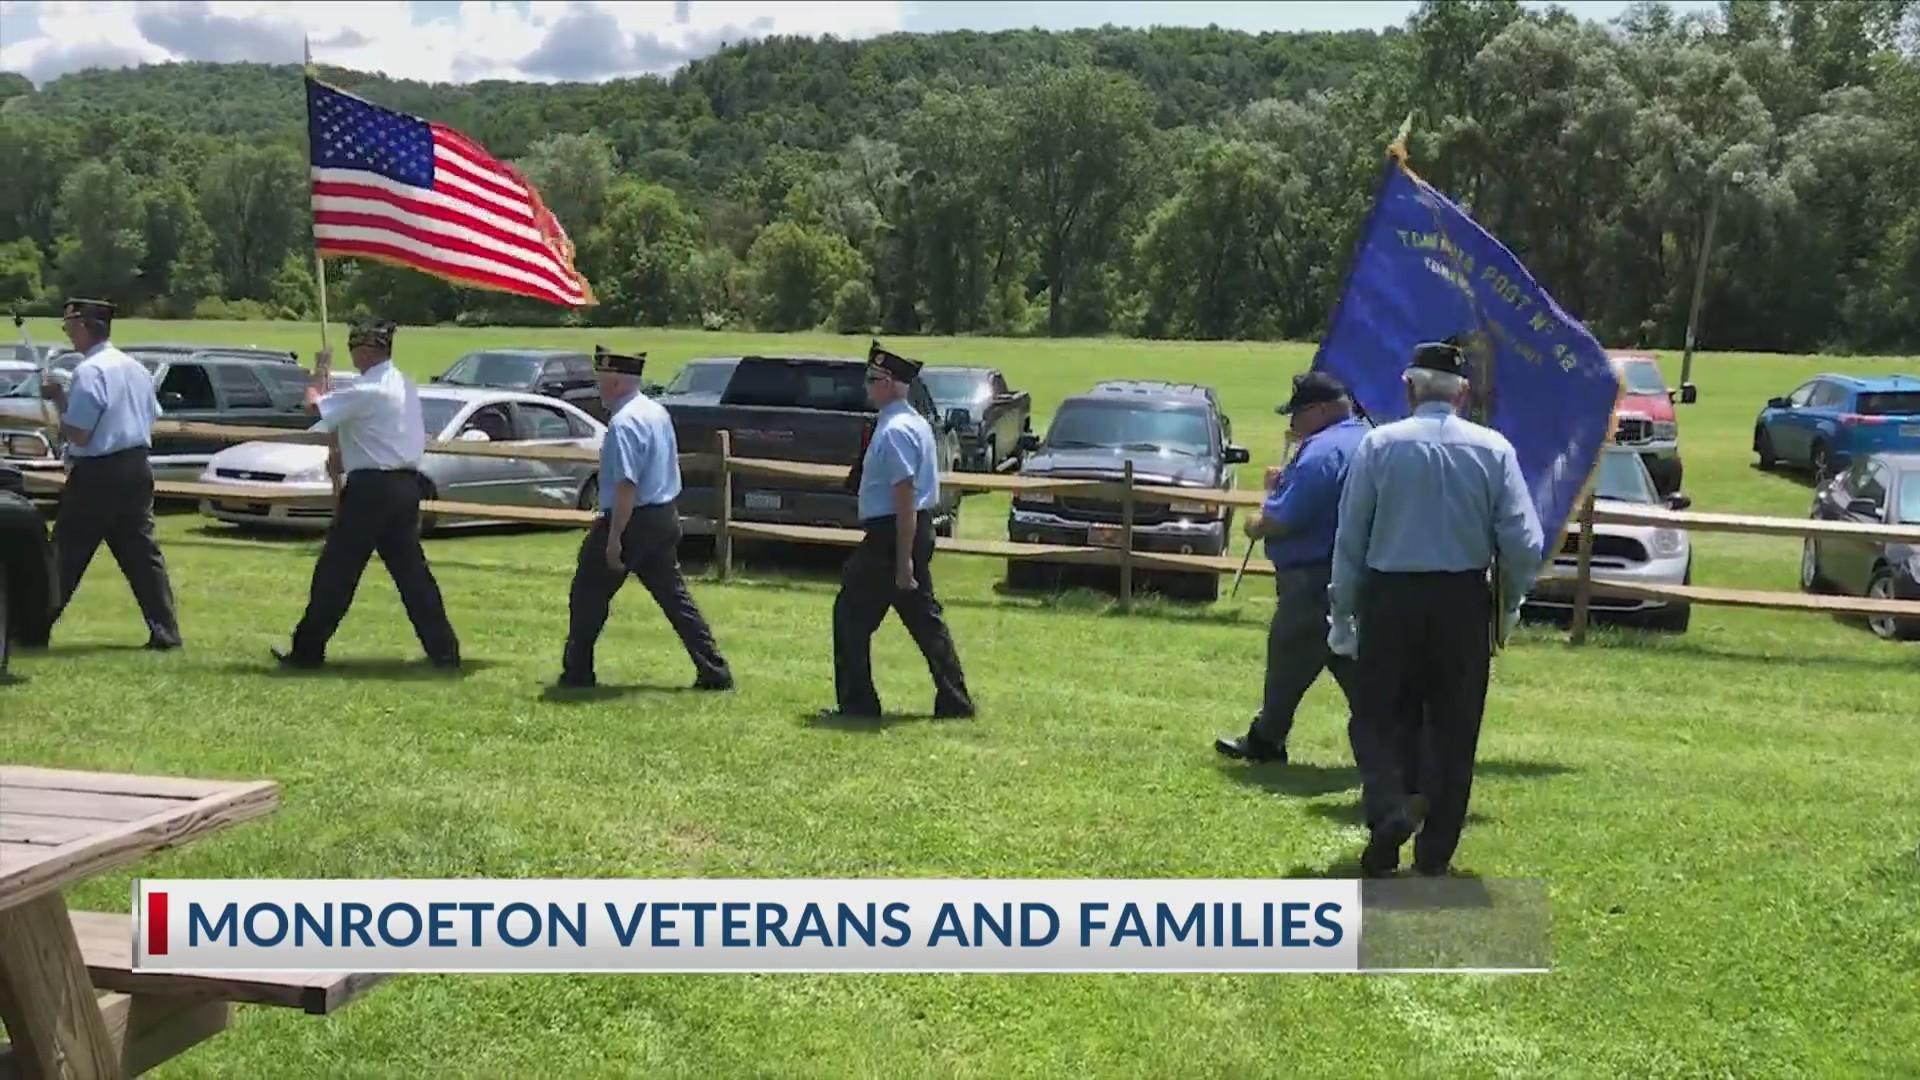 Monroeton Veterans and Families